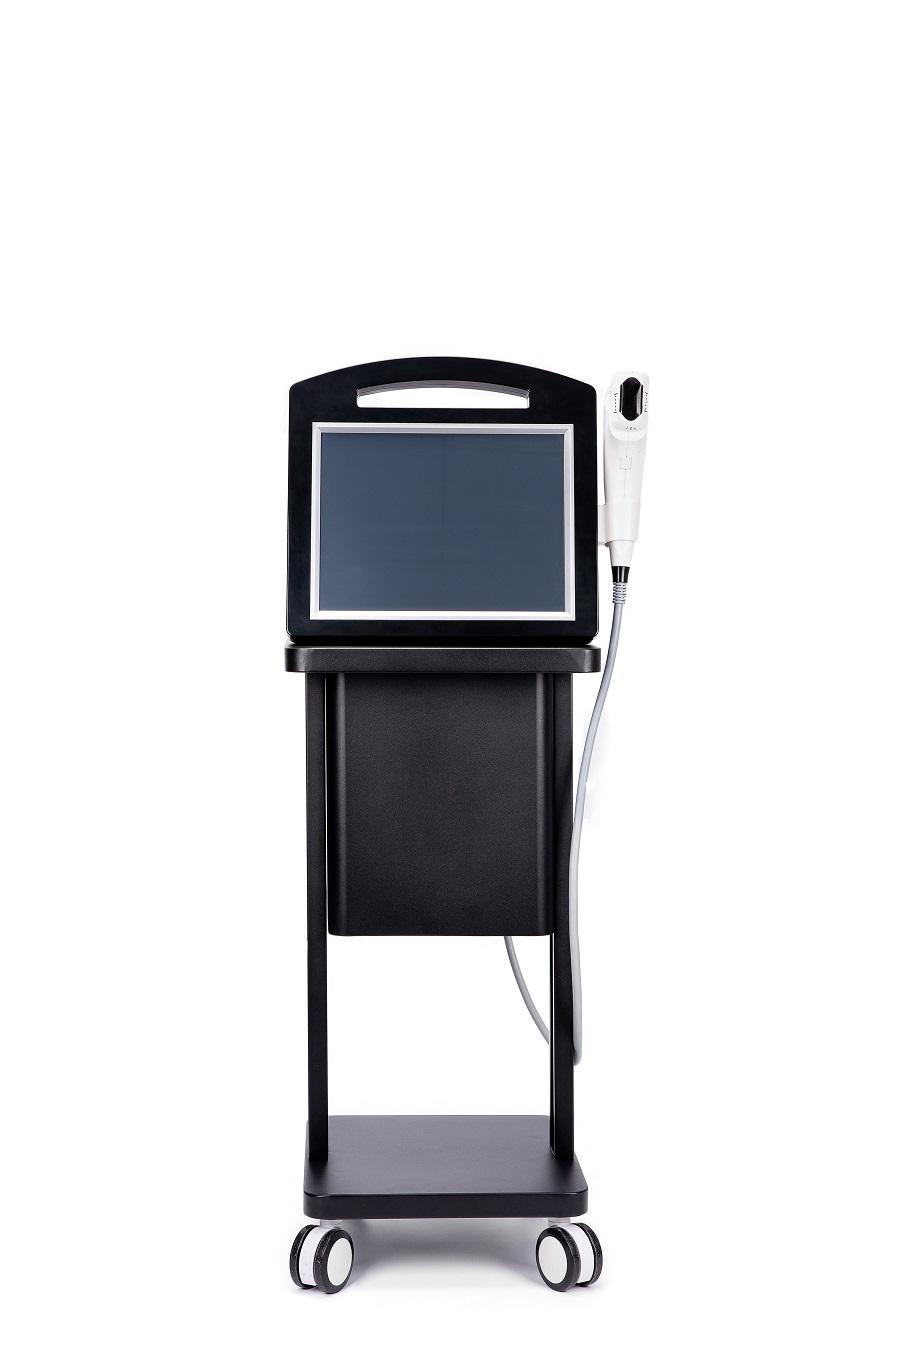 2020 ultrasound machine One shot 12 lines 4D hifu focused ultrasound machine with 1.5/3.0/4.5/8.0/13.0mmcartridges